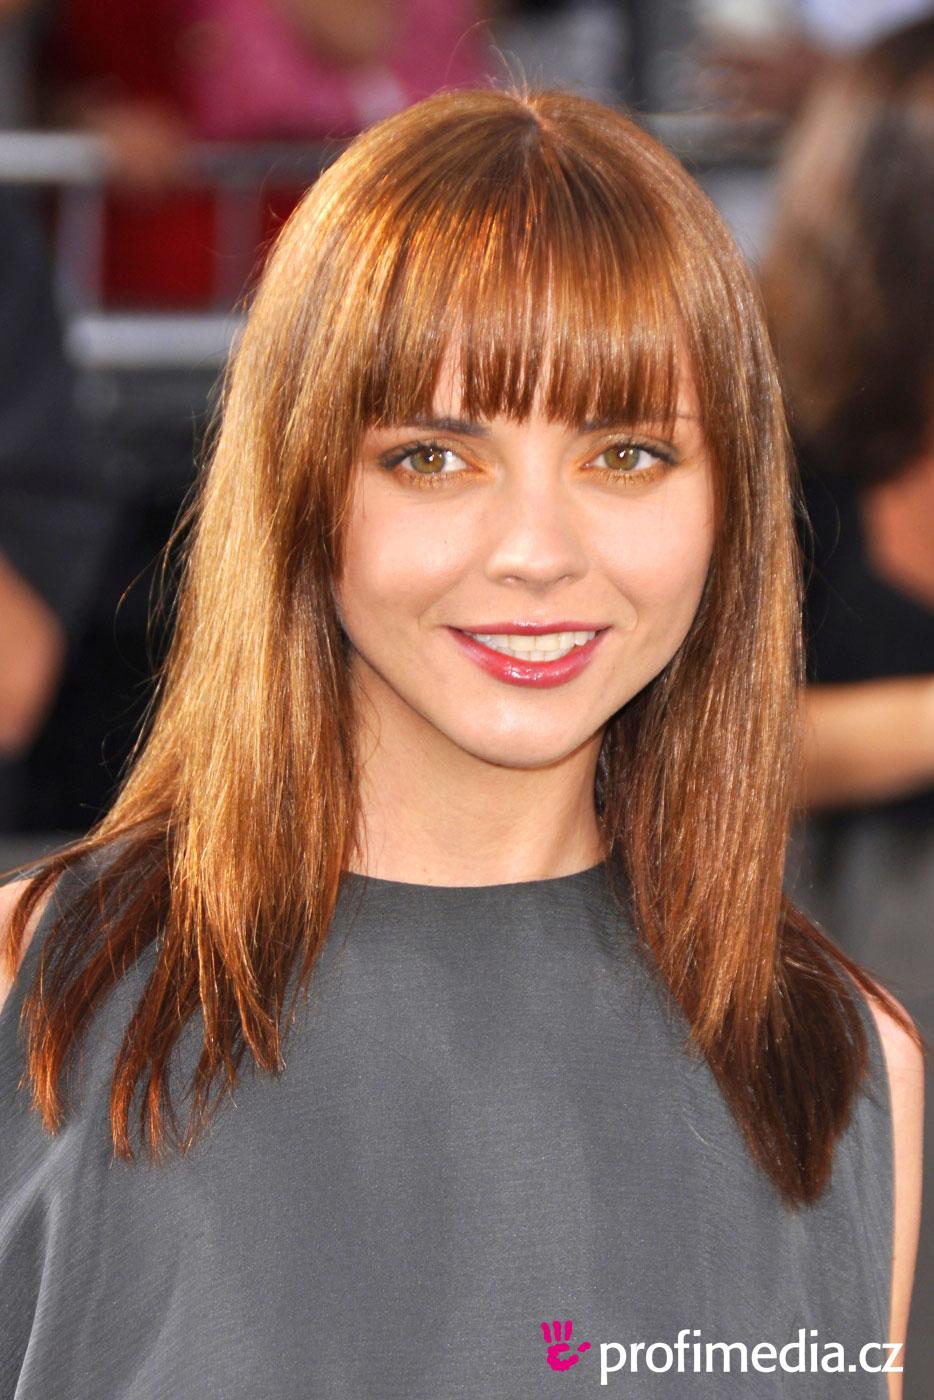 coil hairstyles : Prom hairstyle - Christina Ricci - Christina Ricci